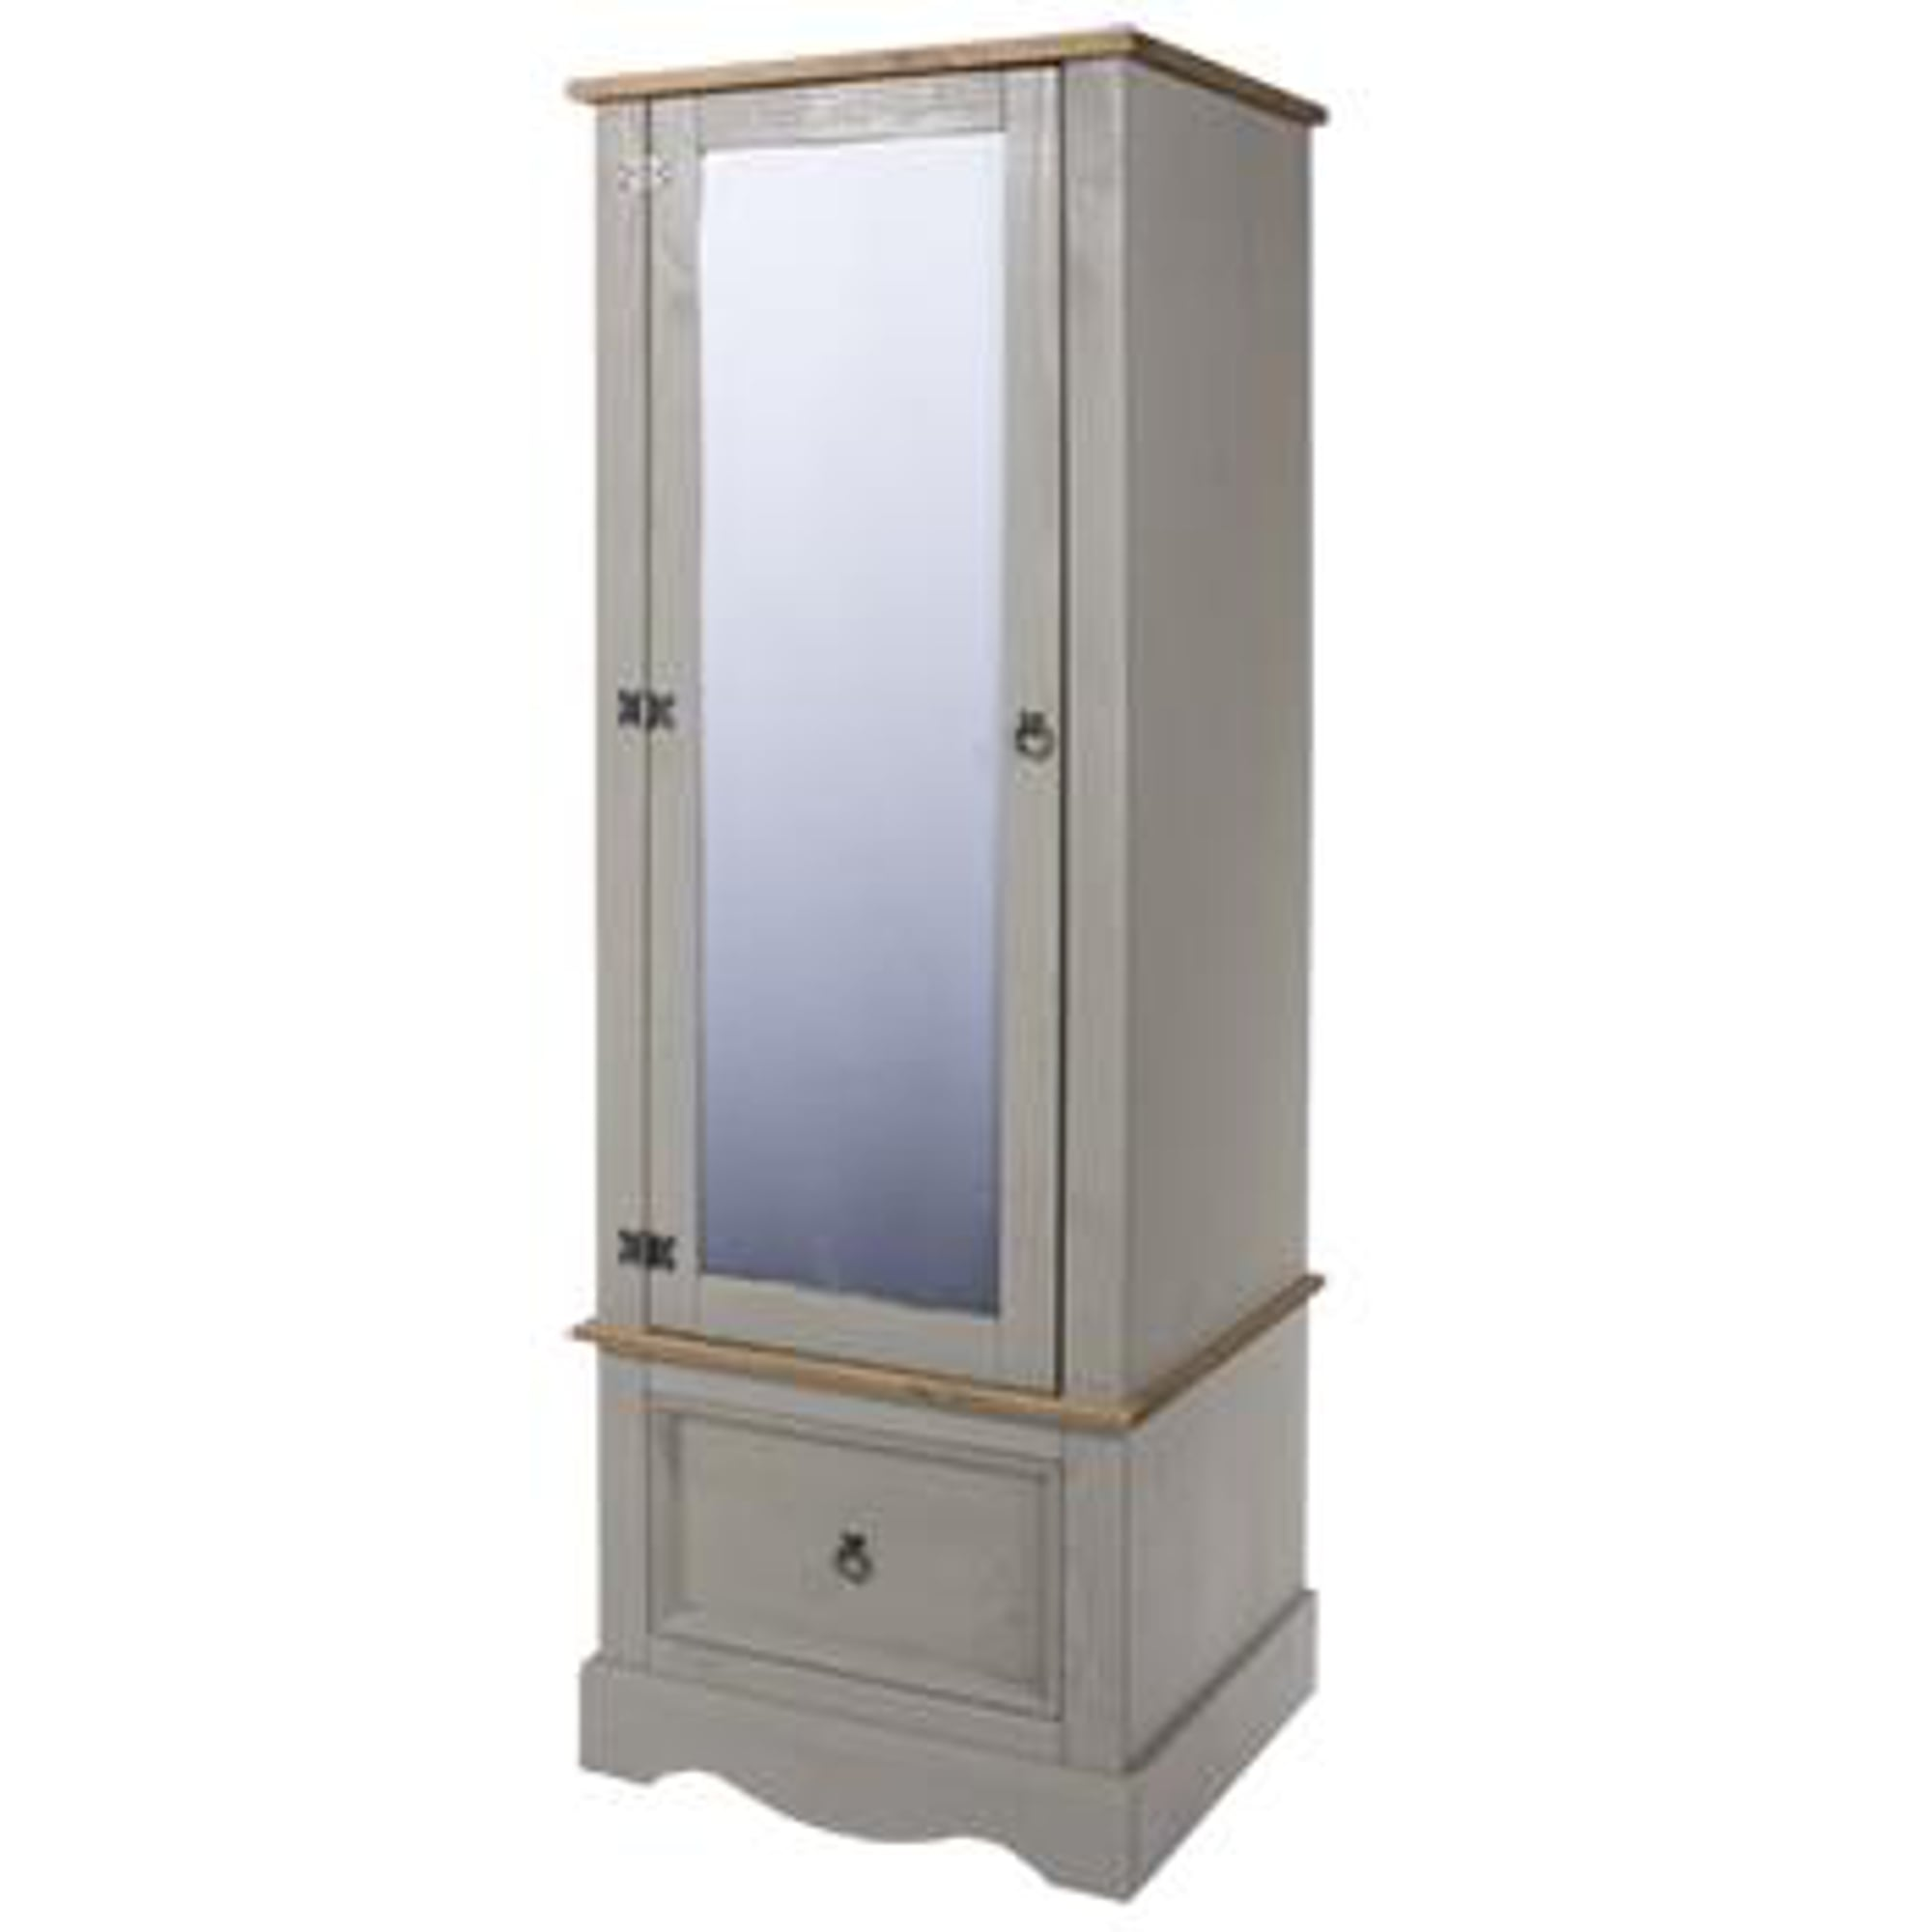 wardrobe armoire euros pin mirrored doors ikea mirror brimnes portes cm storage blanc